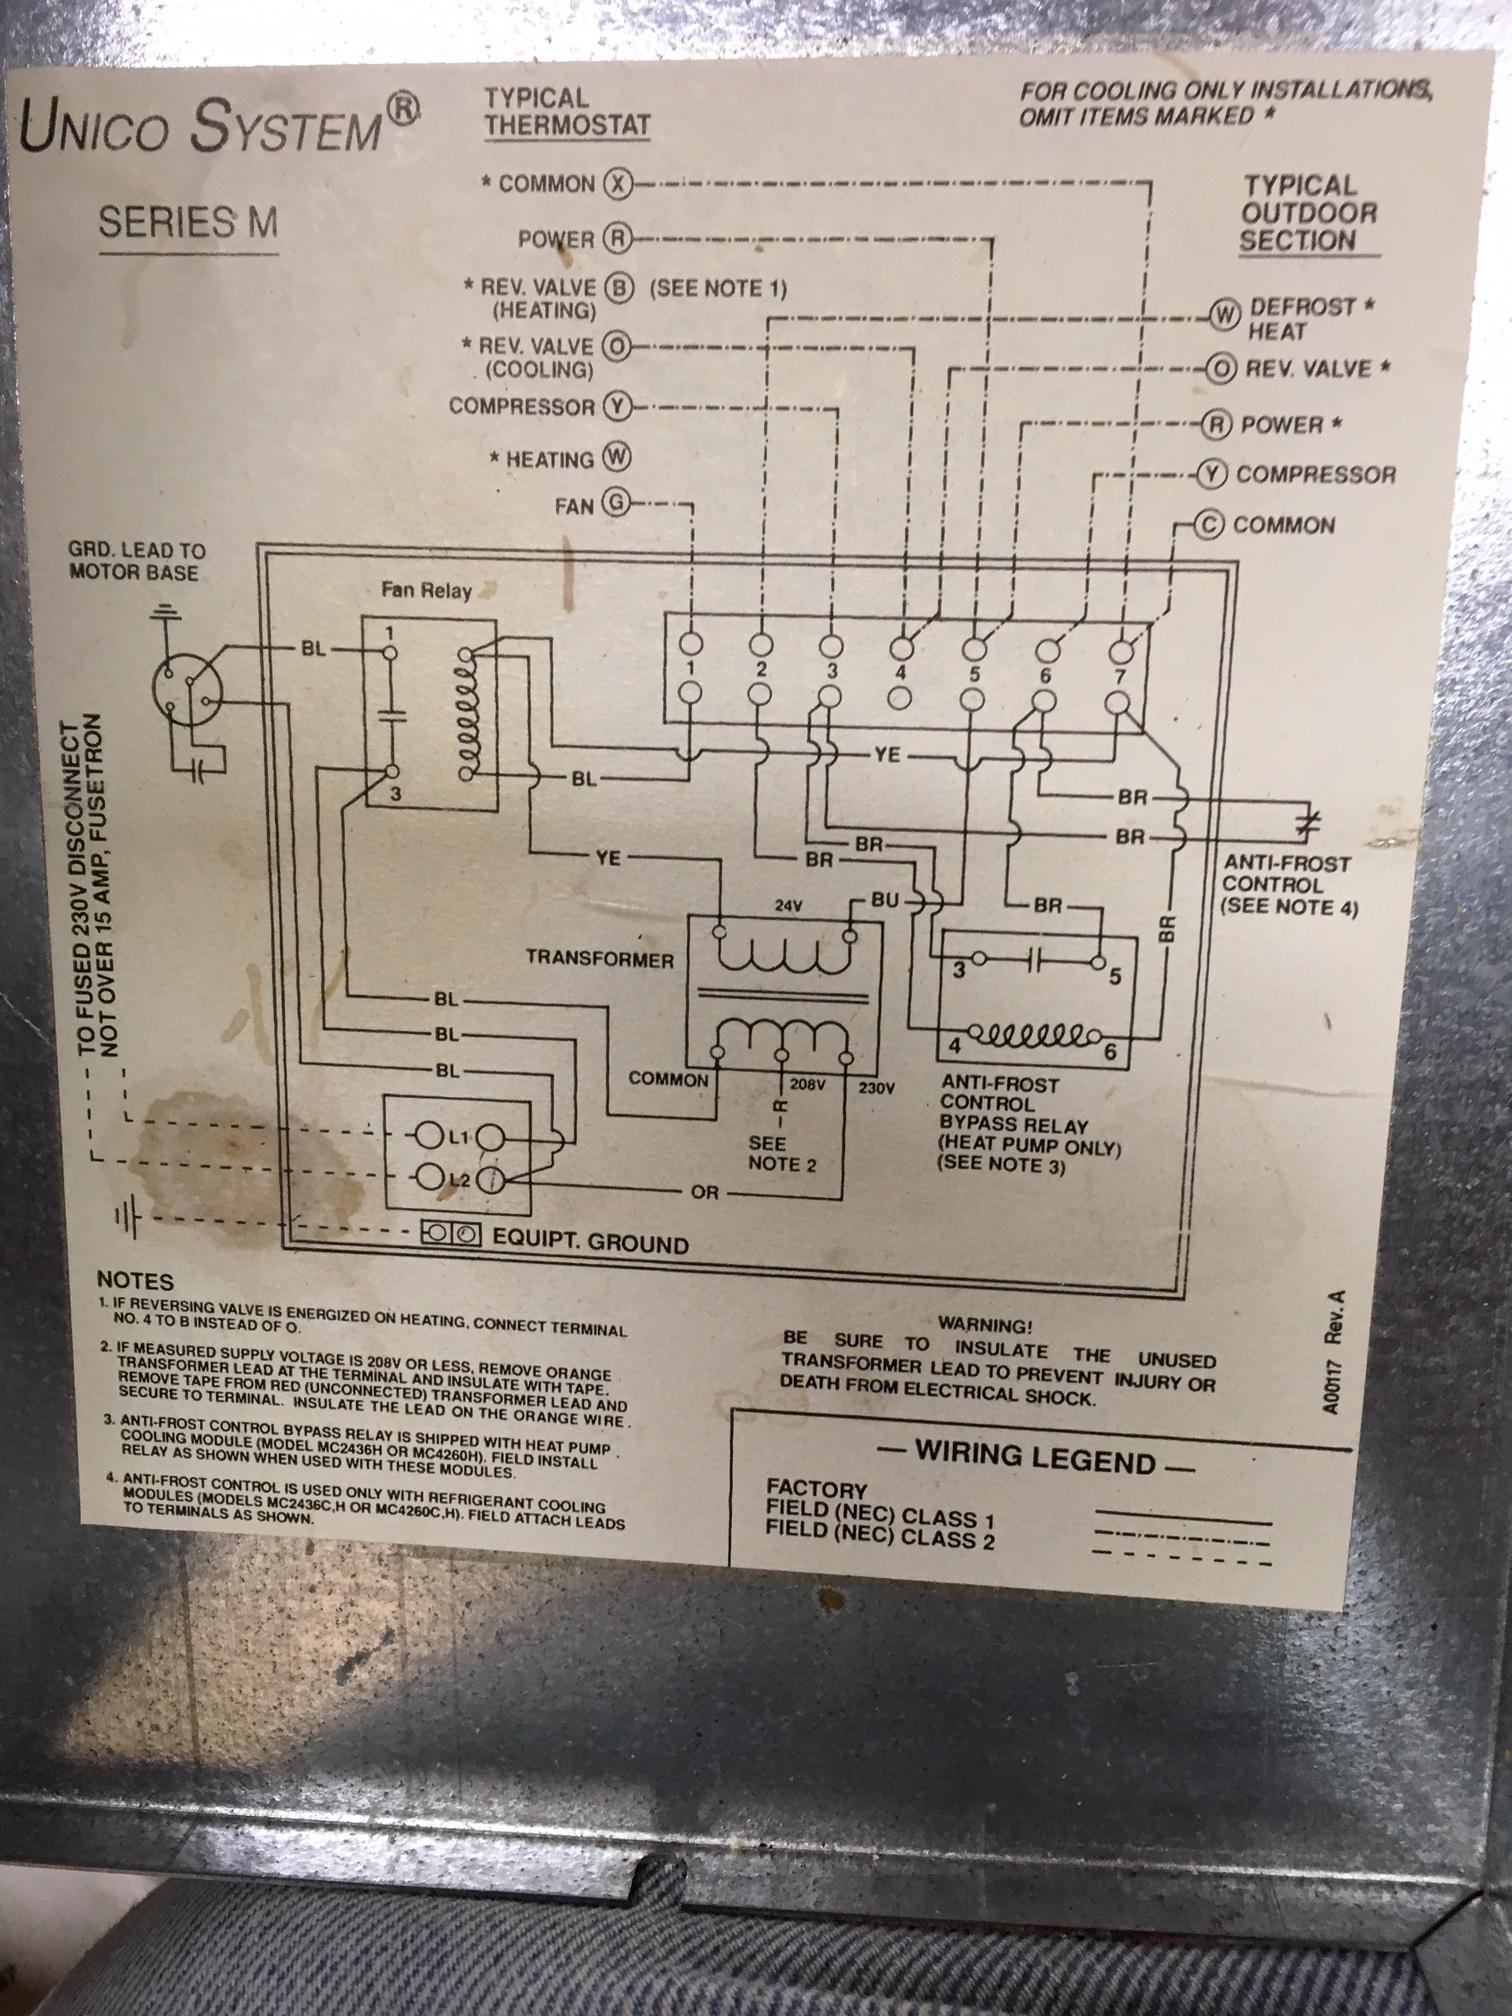 [SODI_2457]   Air Handler Aquastat For Auto Mode Is Blowing The Transformer - HVAC - DIY  Chatroom Home Improvement Forum | Aquastat Wiring Diagram |  | DIY Chatroom